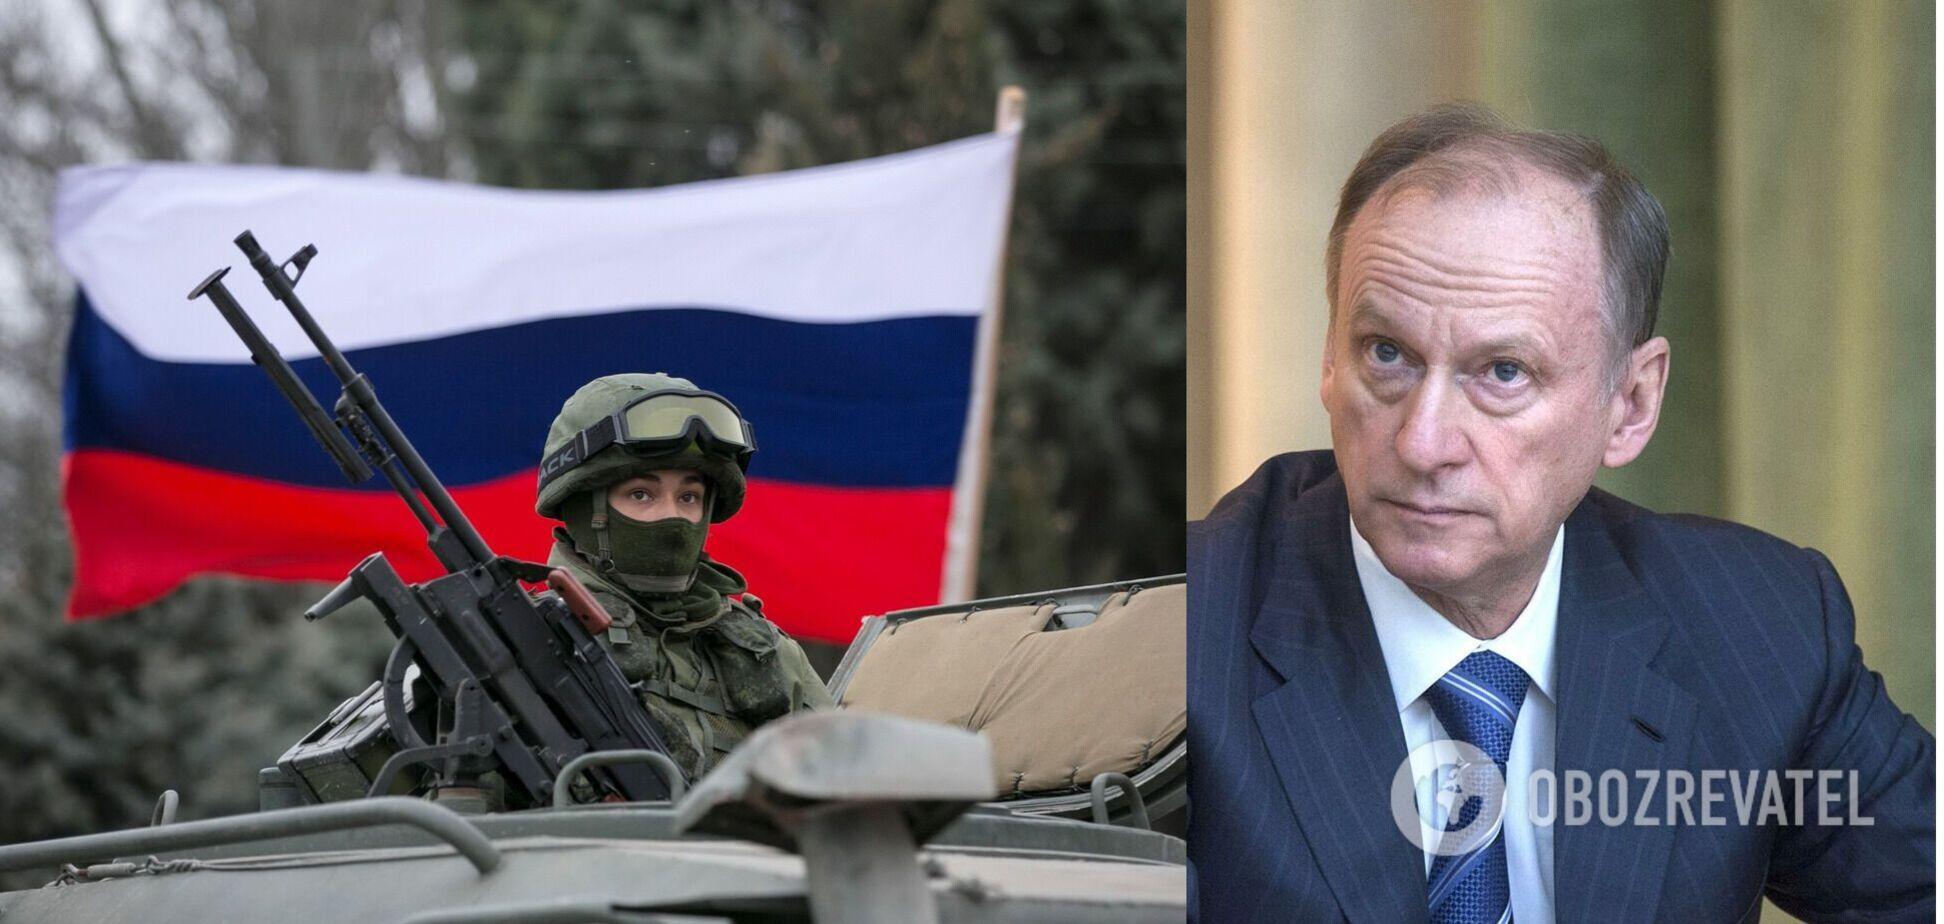 Глава Радбезу РФ пригрозив ужити 'конкретних заходів' проти України